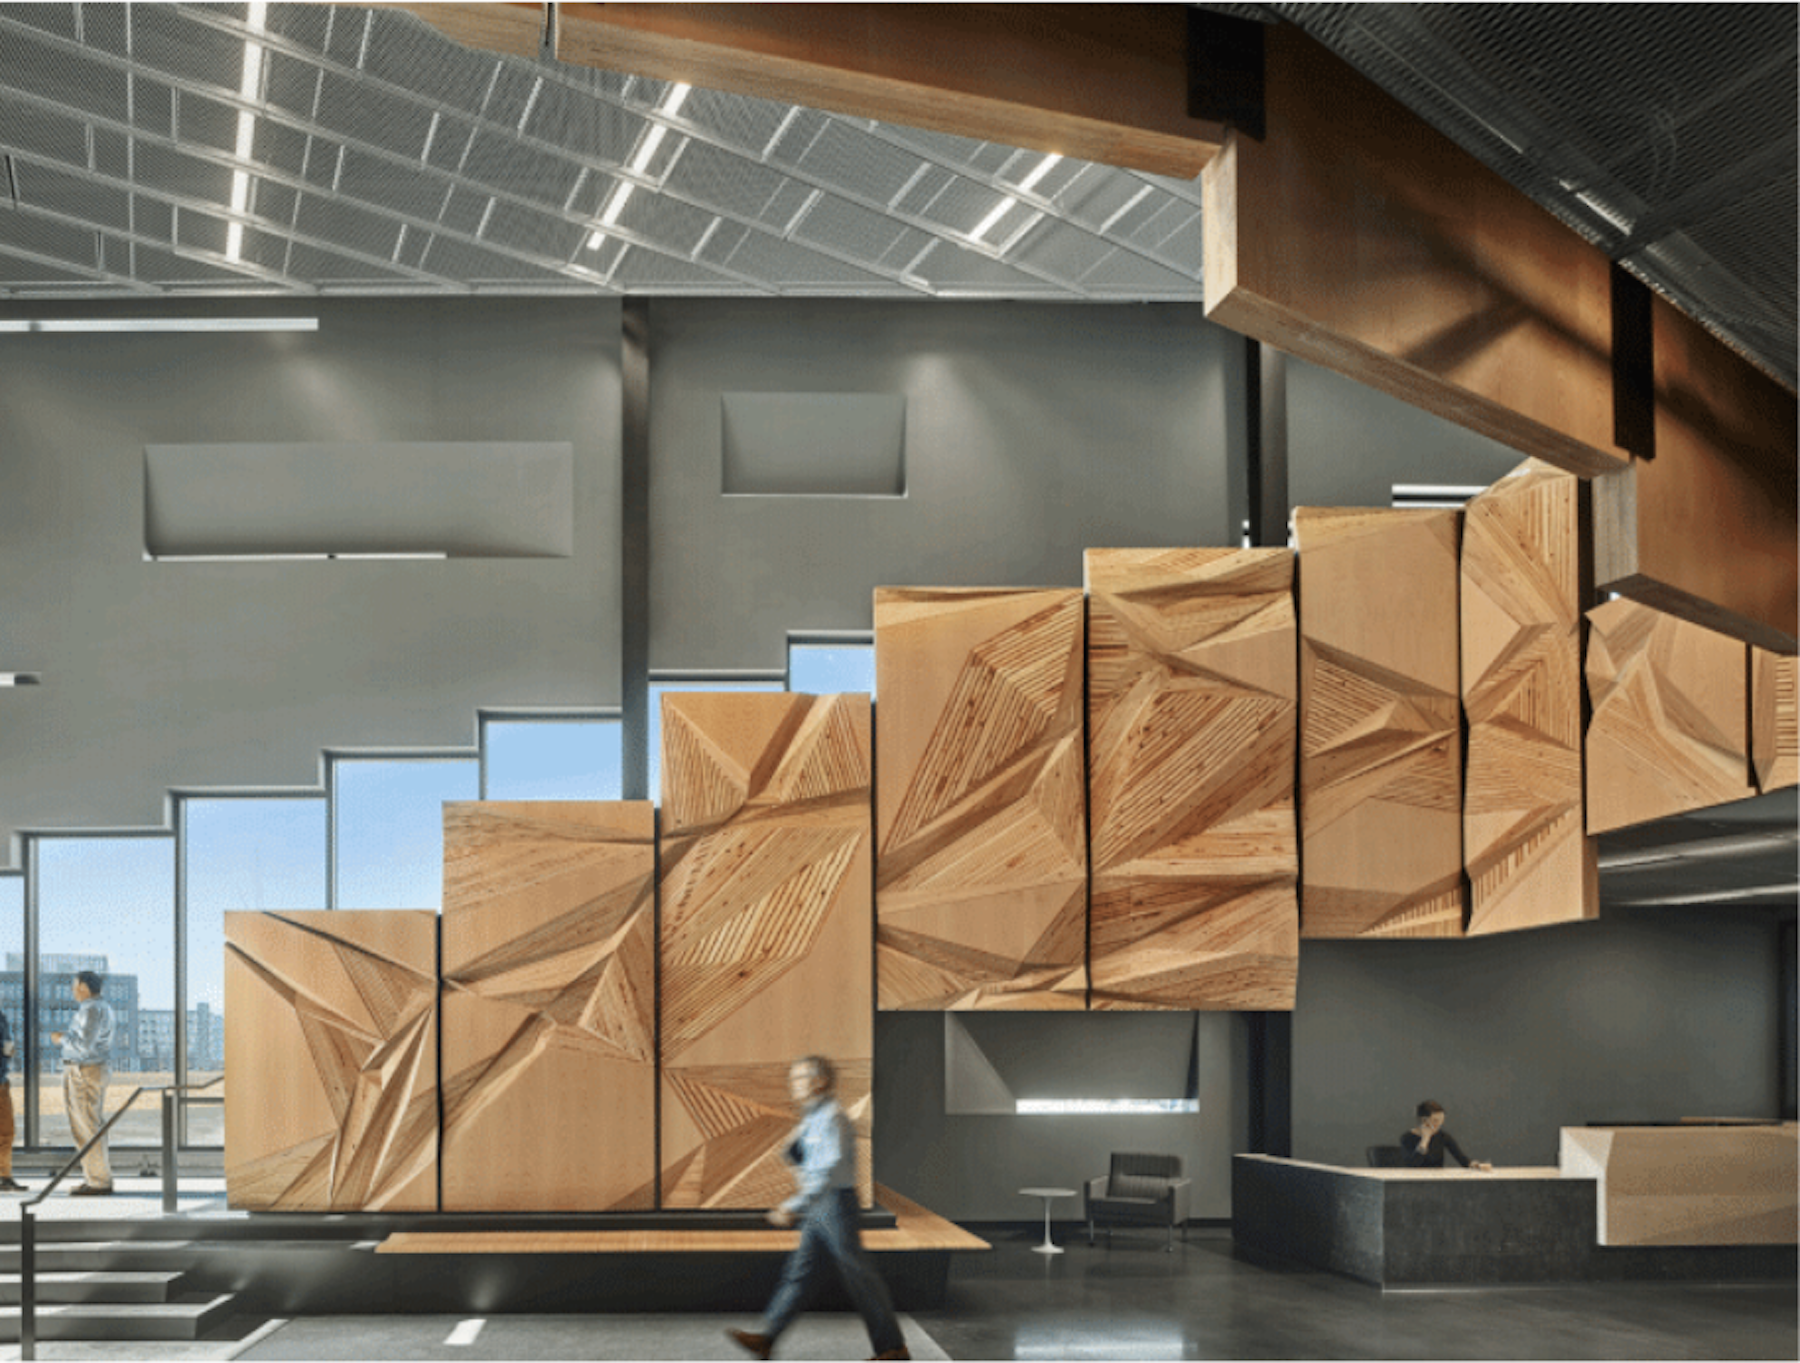 9 Winning Projects Of AIA Philadelphias 2017 Design Awards